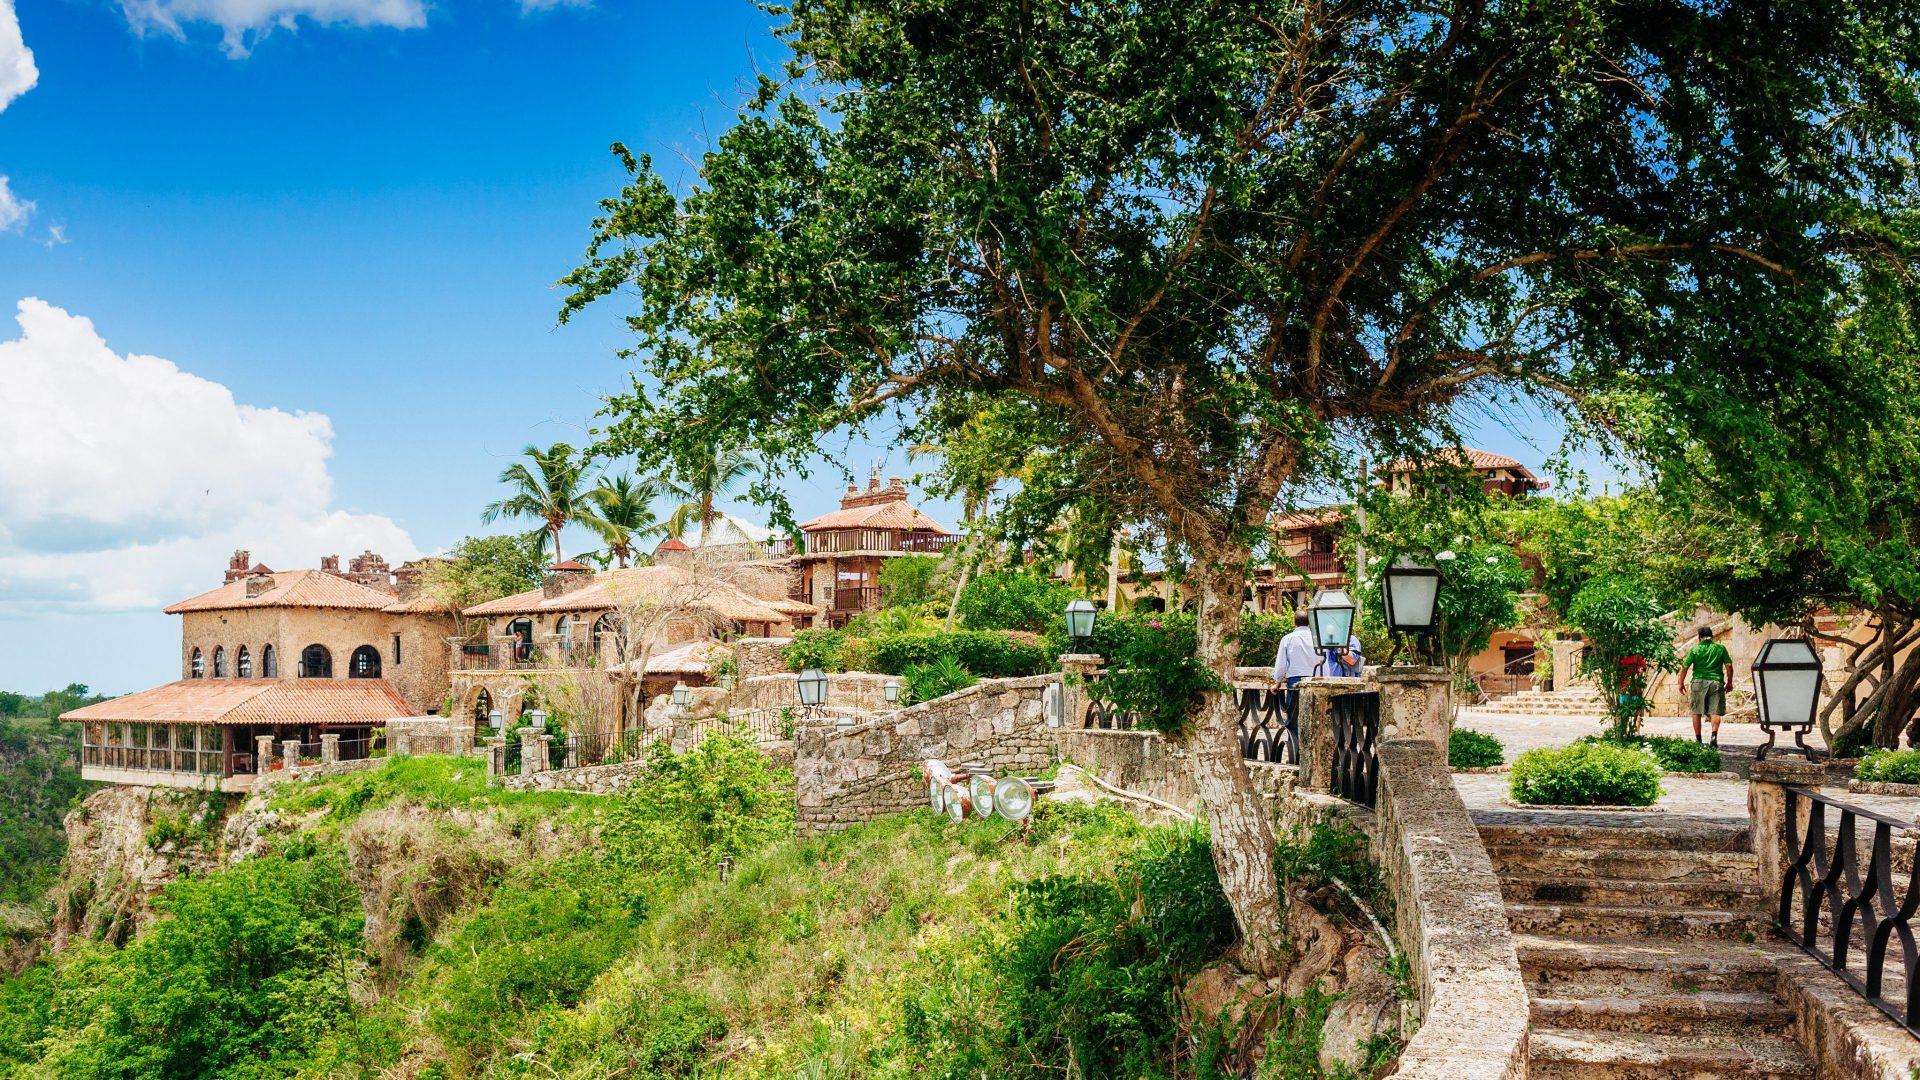 Aplankykite graikiško stiliaus kaimelį - Altos de Chavon